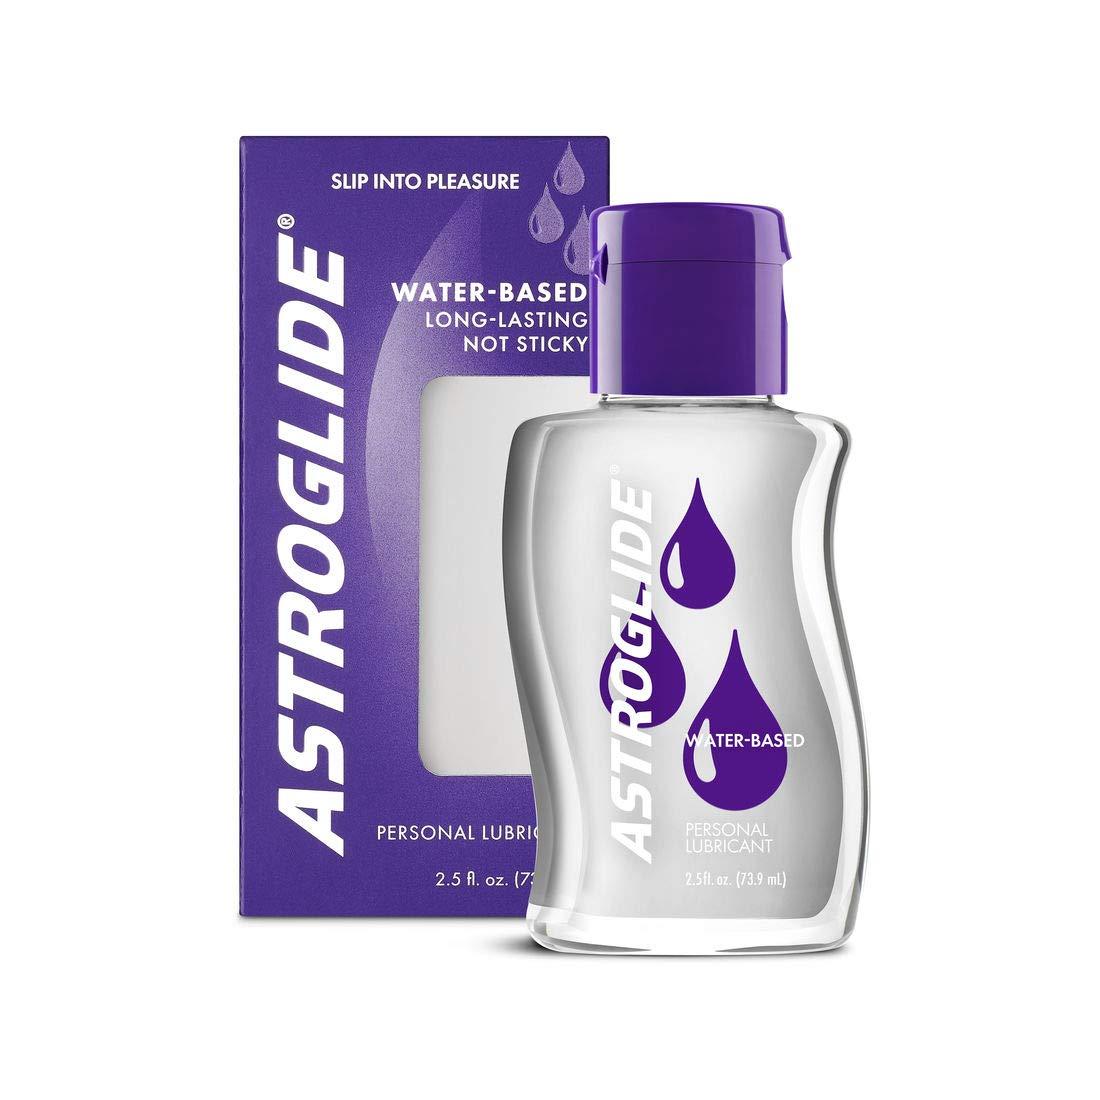 Astroglide Liquid, Water Based Personal Lubricant, 2.5 oz.